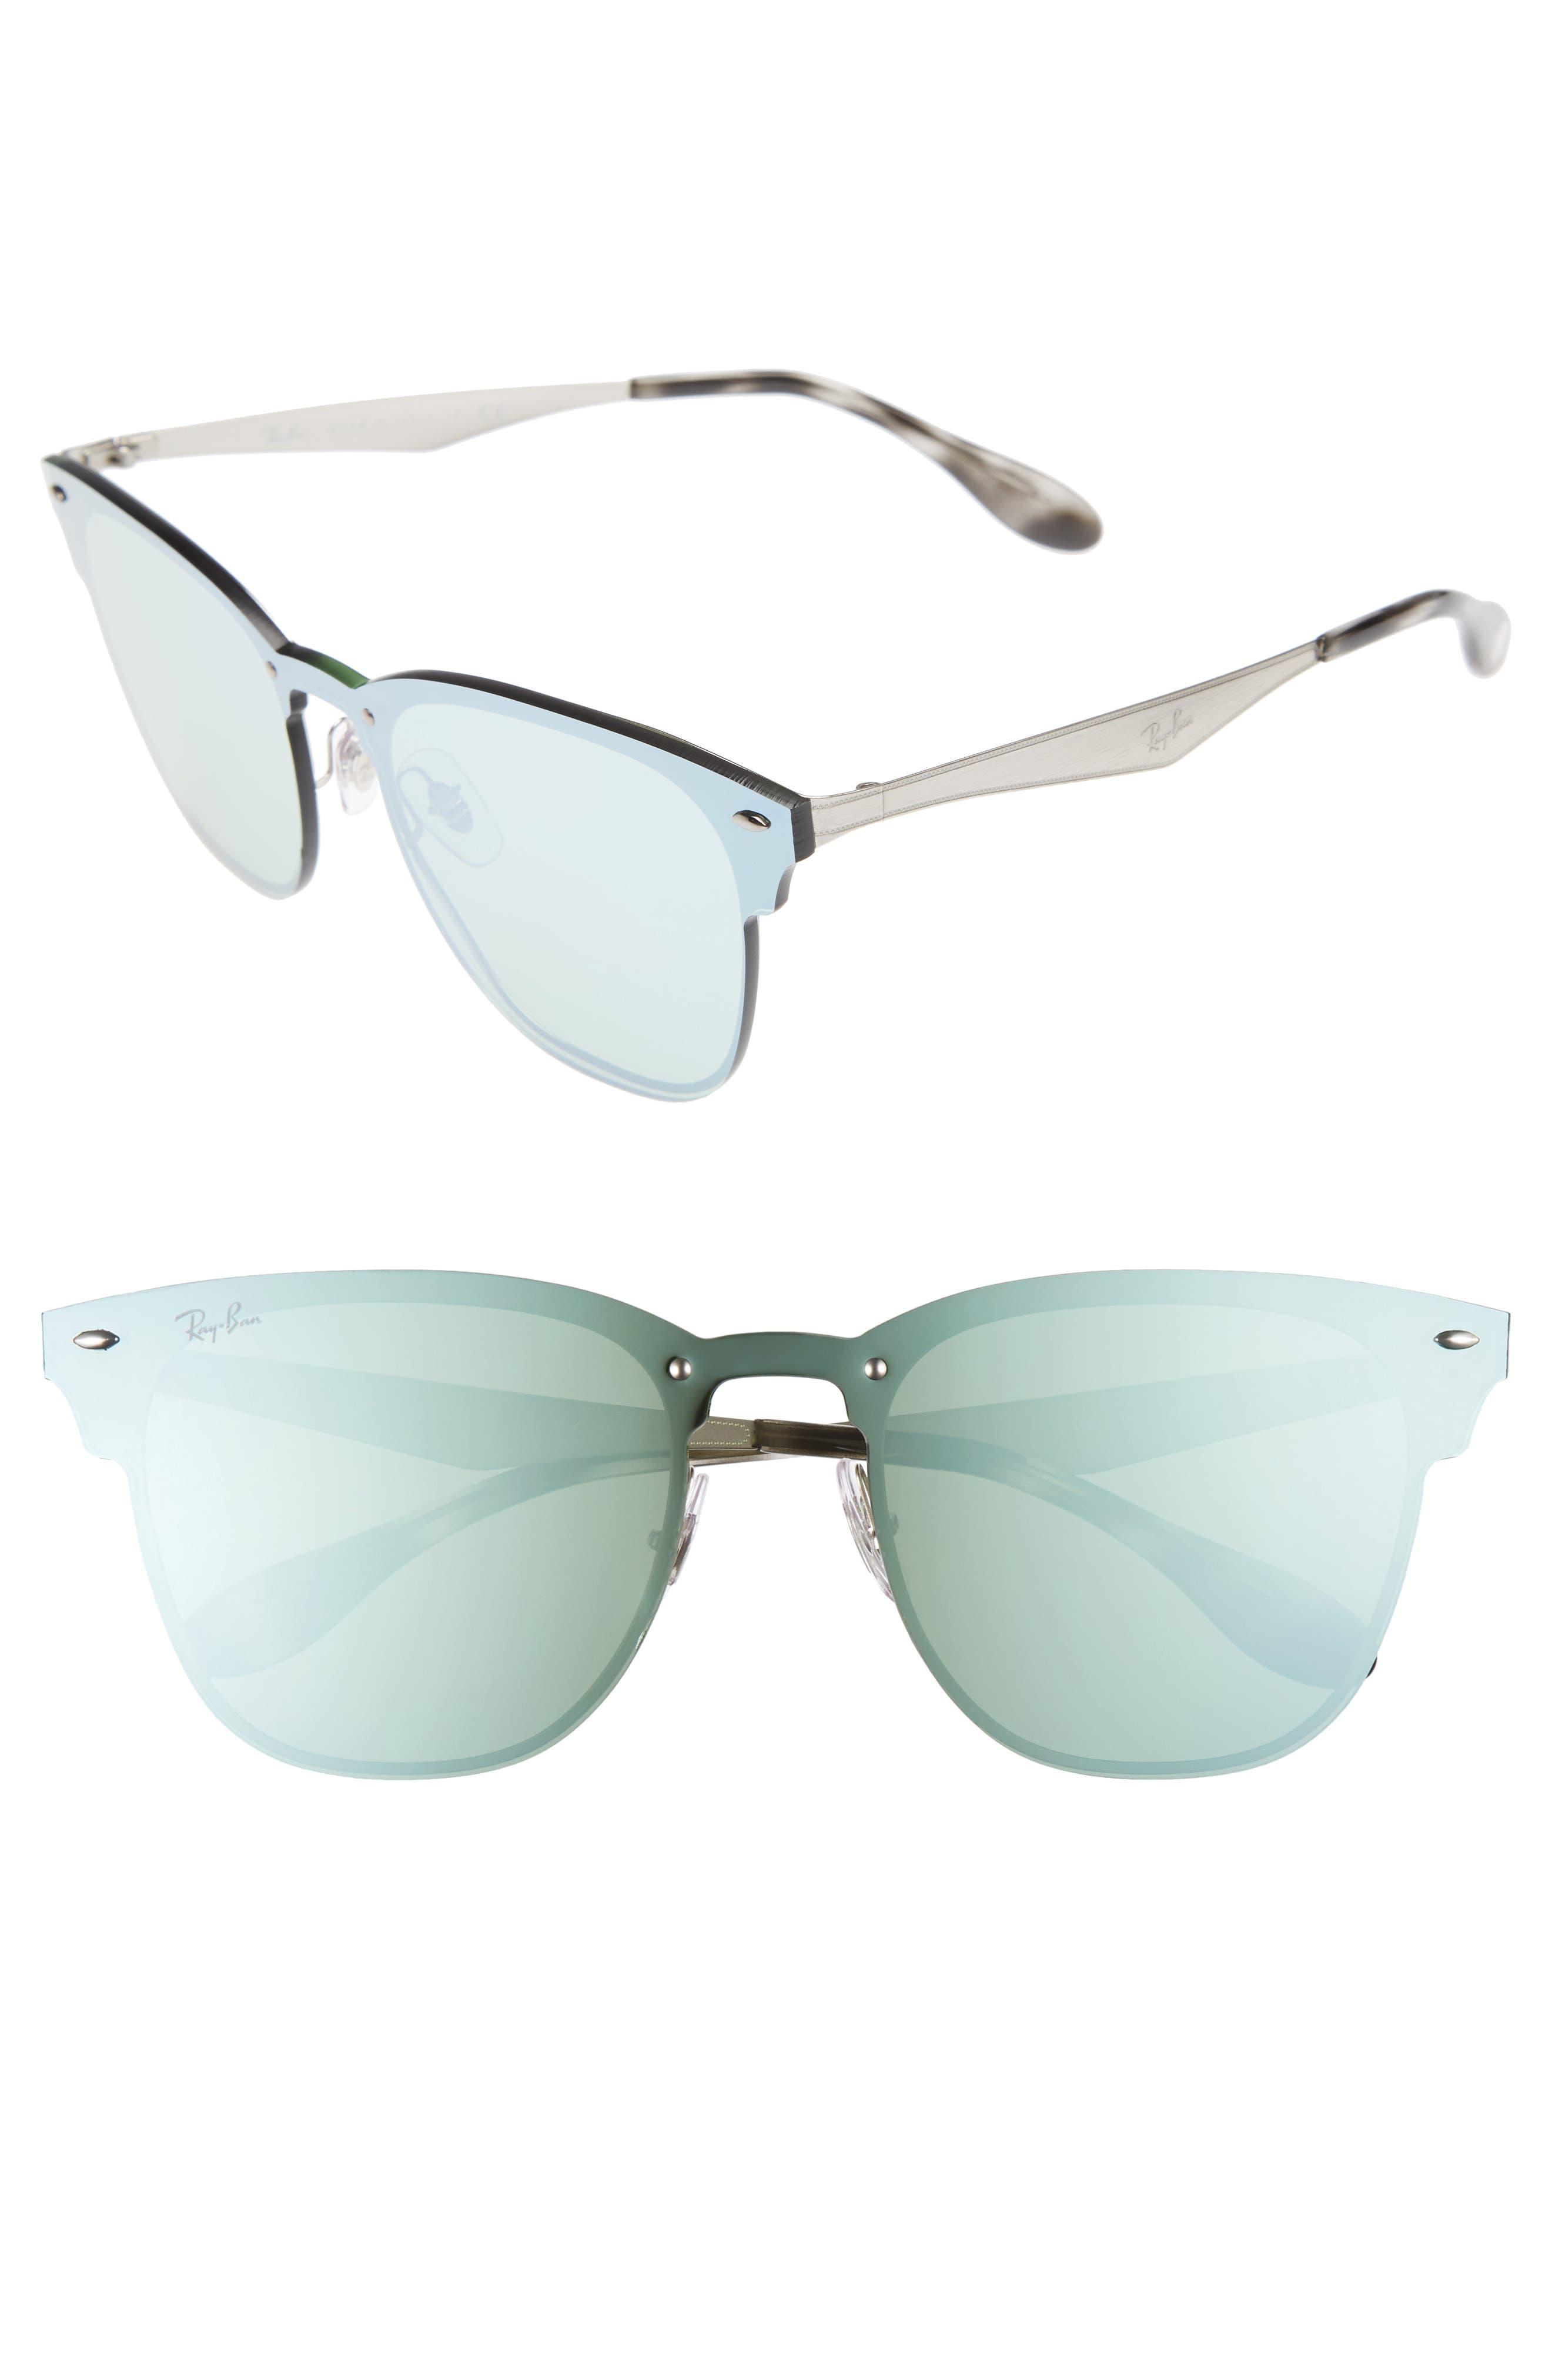 Wayfarer 42mm Sunglasses,                             Main thumbnail 1, color,                             Silver